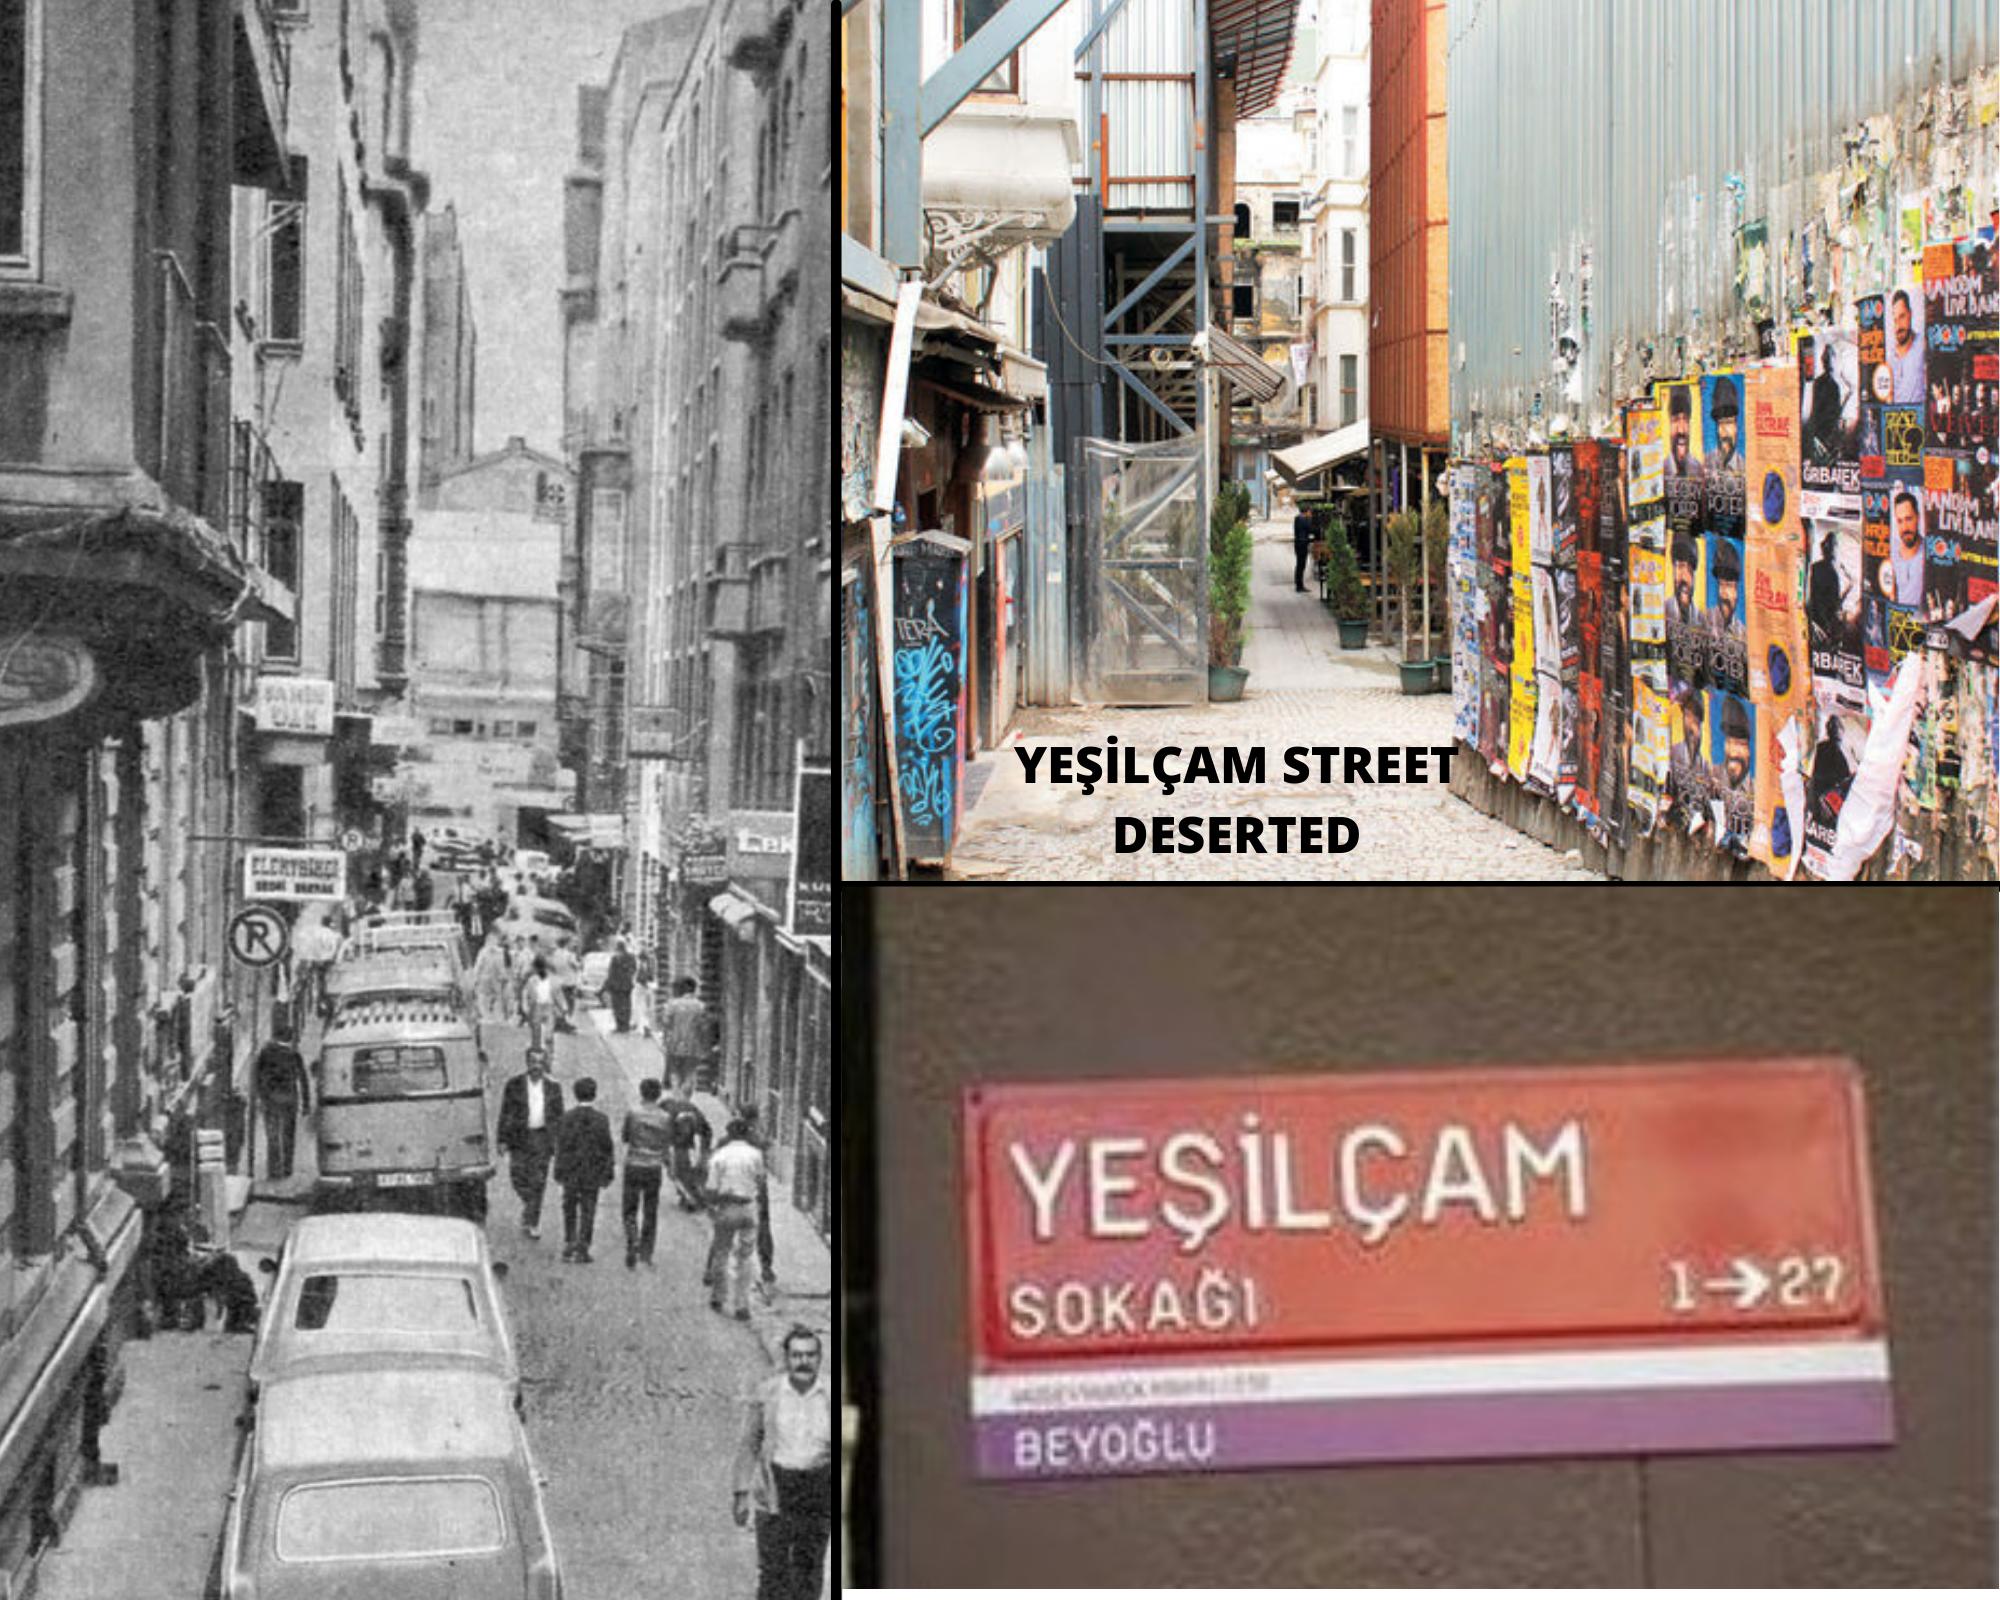 Yeşilçam's Legacy: Lost But Not Forgotten